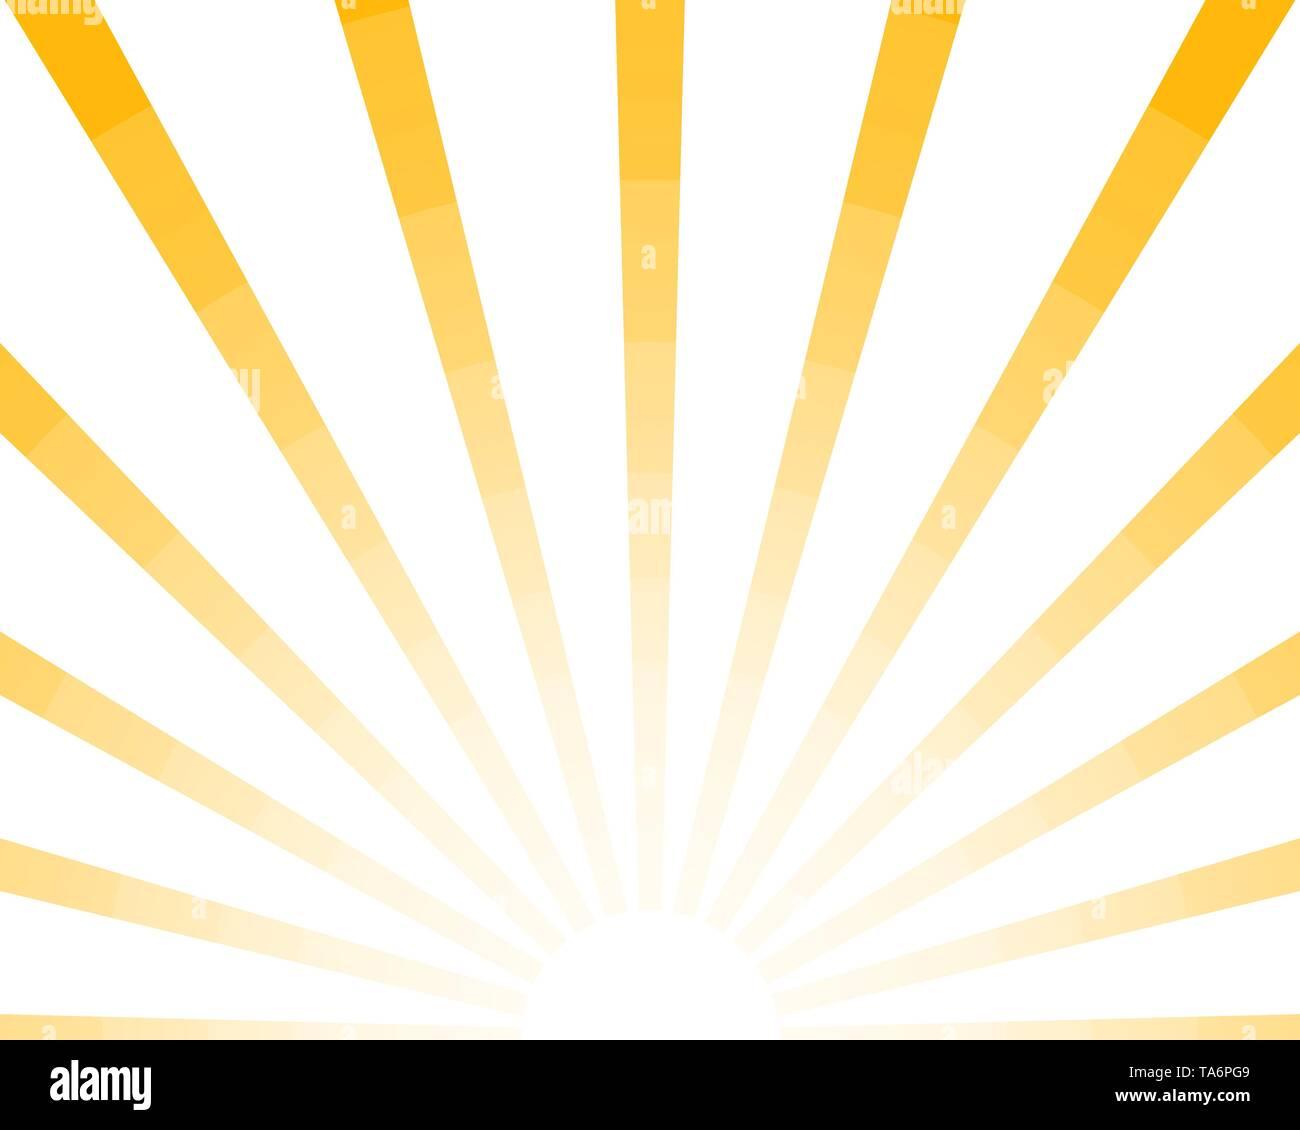 a1563c4482c46 Half Sun Rays retro background, yellow colored sunburst stylish. Shine  Summer pattern Eps 10. Vector starburst illustration